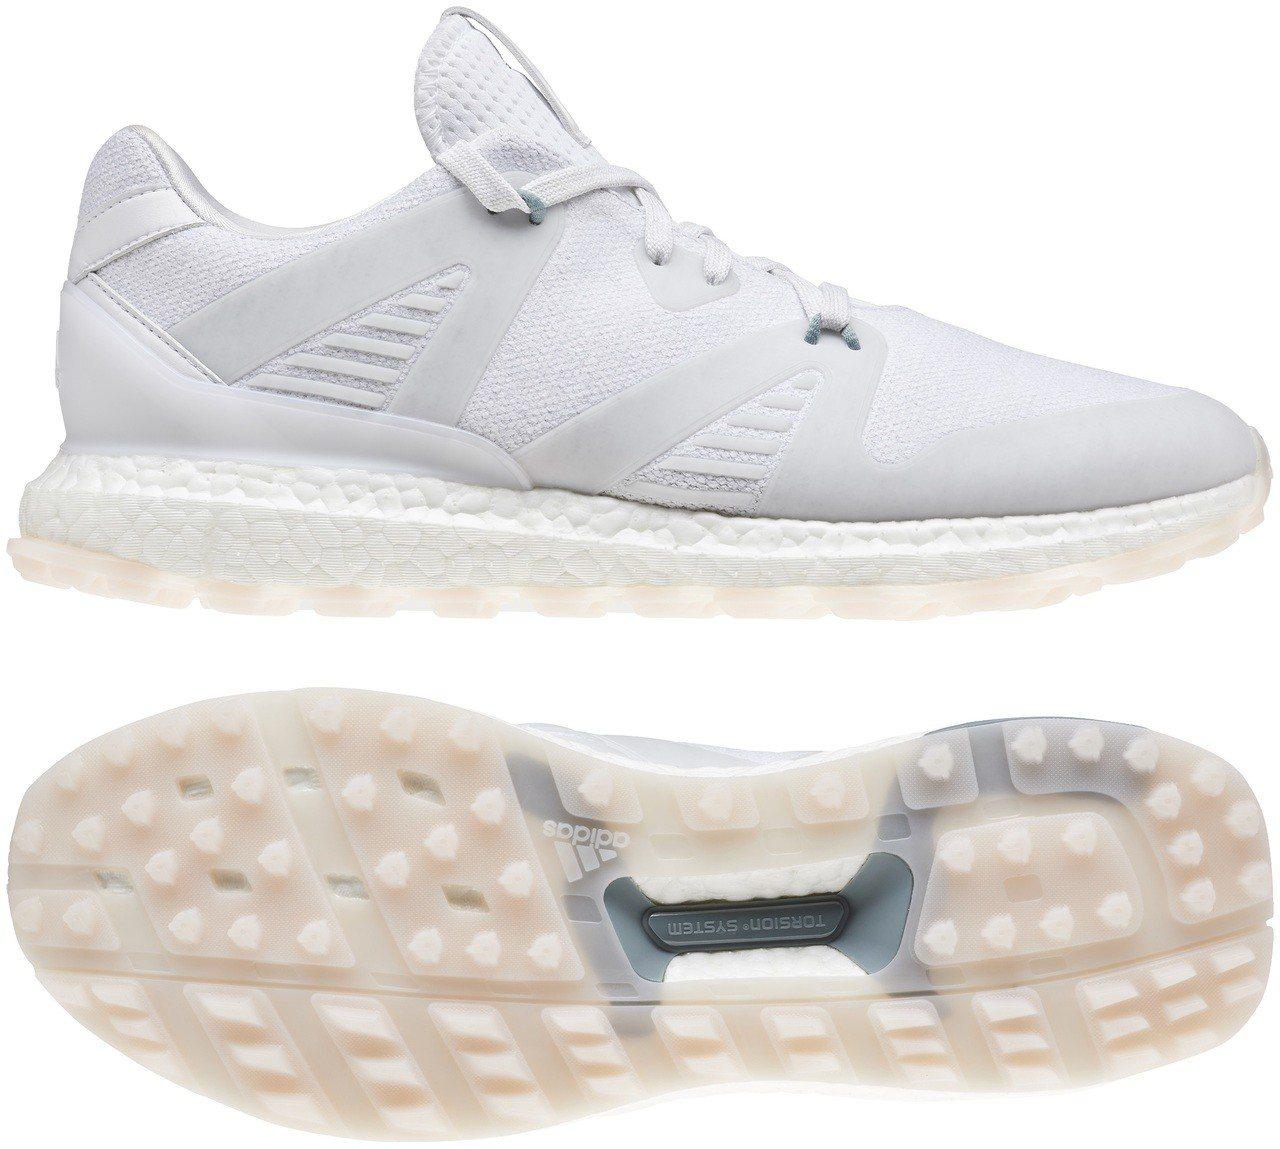 adidas Golf男款「櫻花鞋」,售價6,480元。圖/adidas Gol...